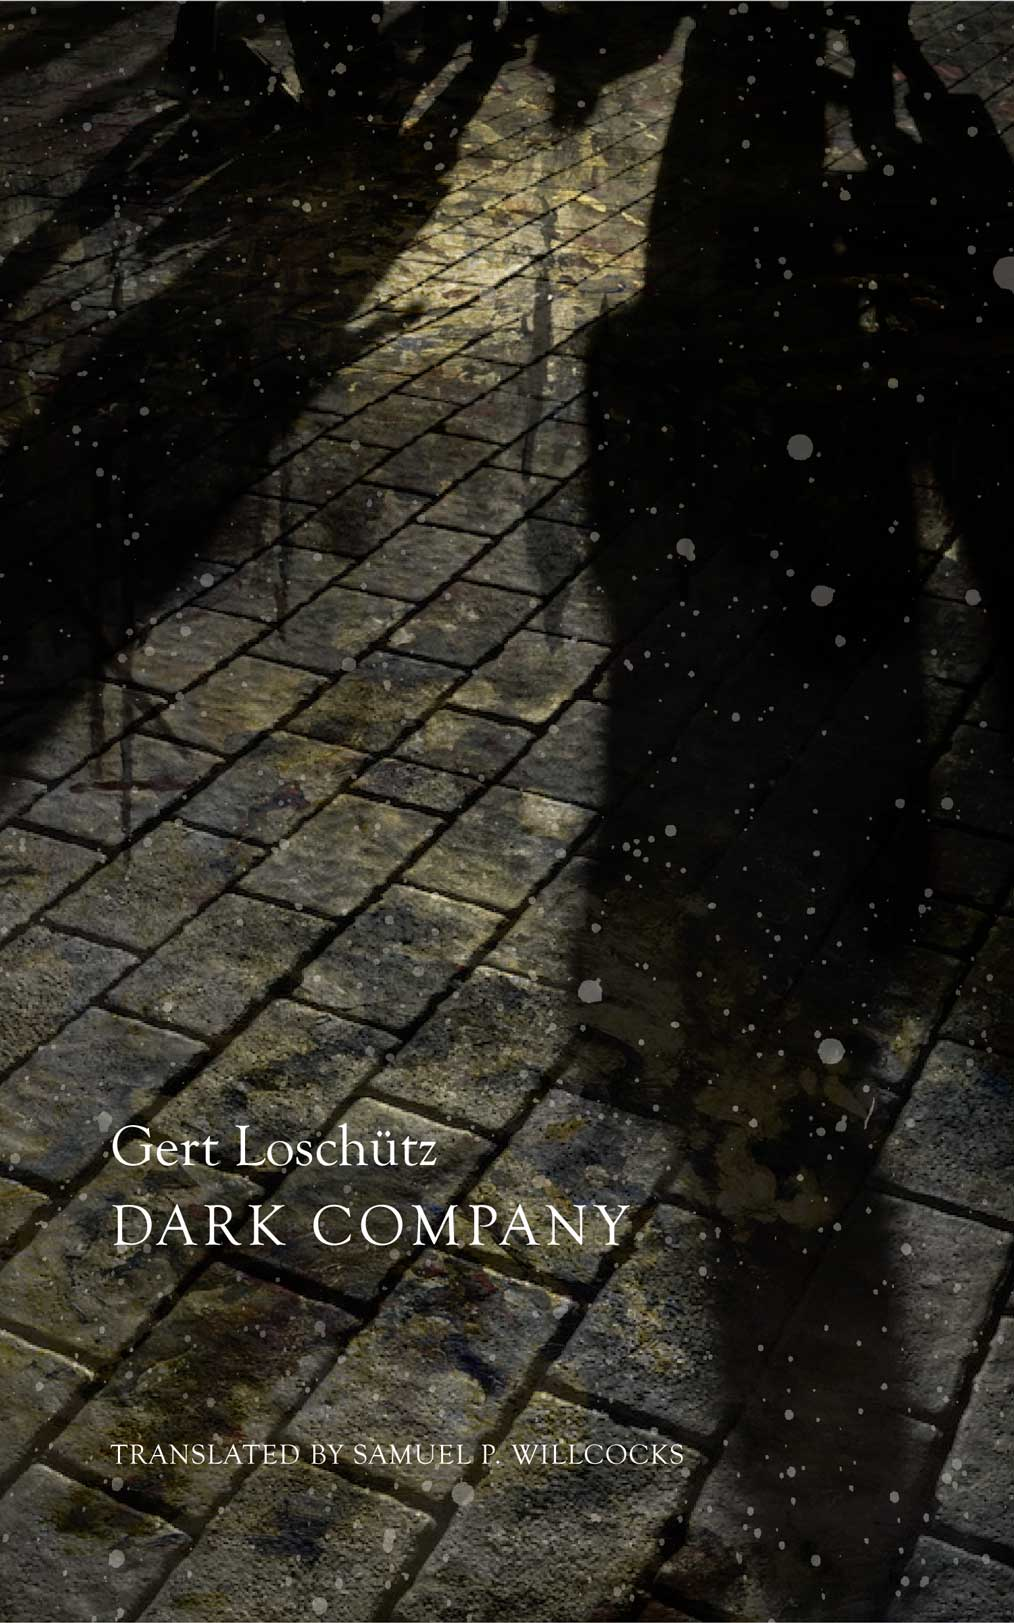 Dark Company: A Novel in Ten Rainy Nights by Gert Loschütz | Seagull Books